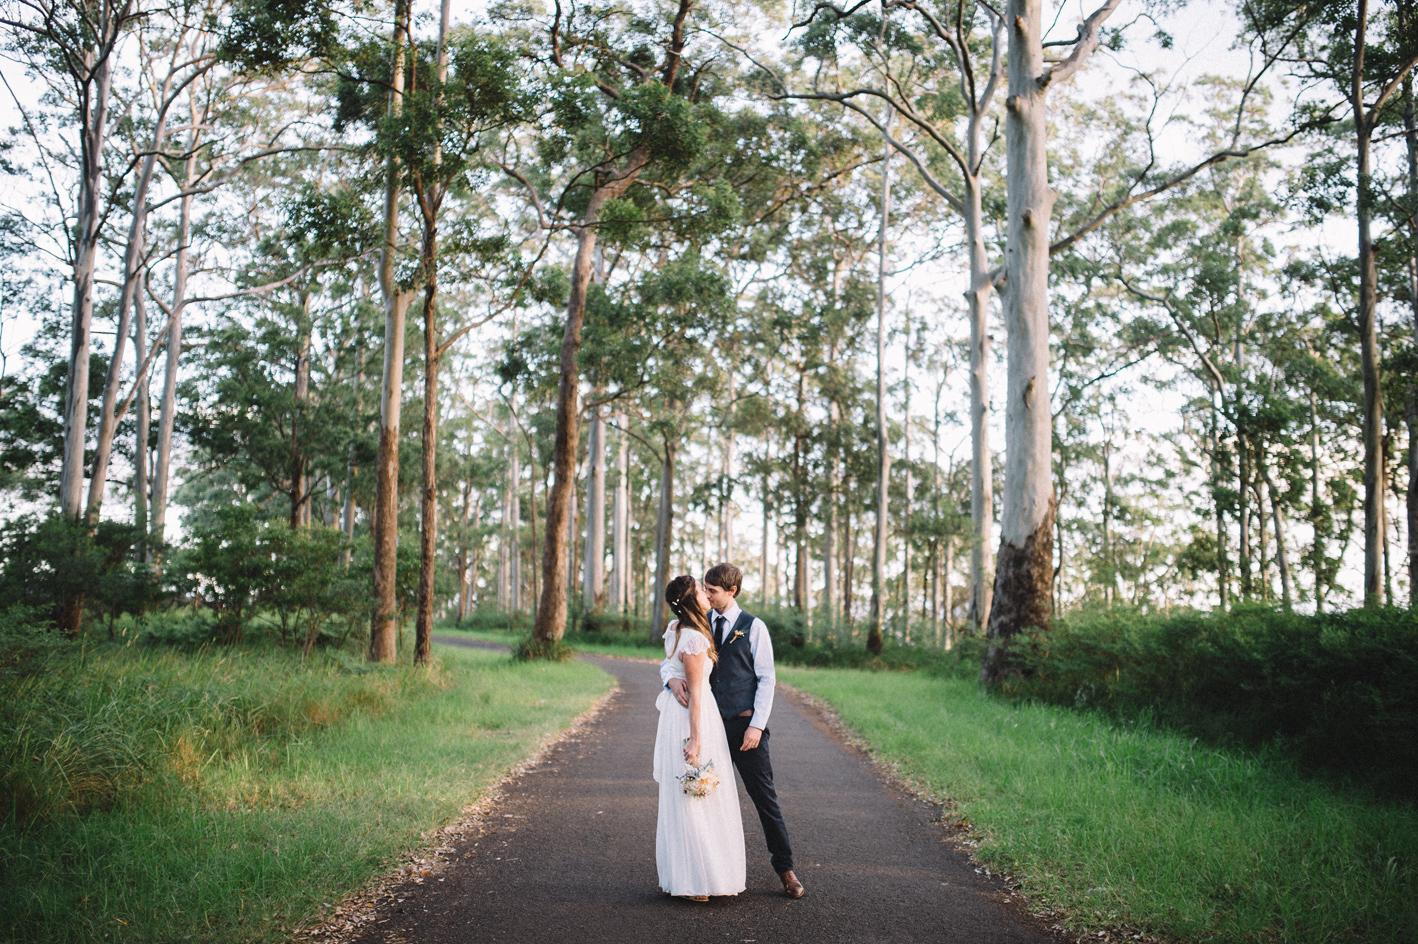 056-michelle-reagan-mount-tamborine-wedding-sophie-baker-photography